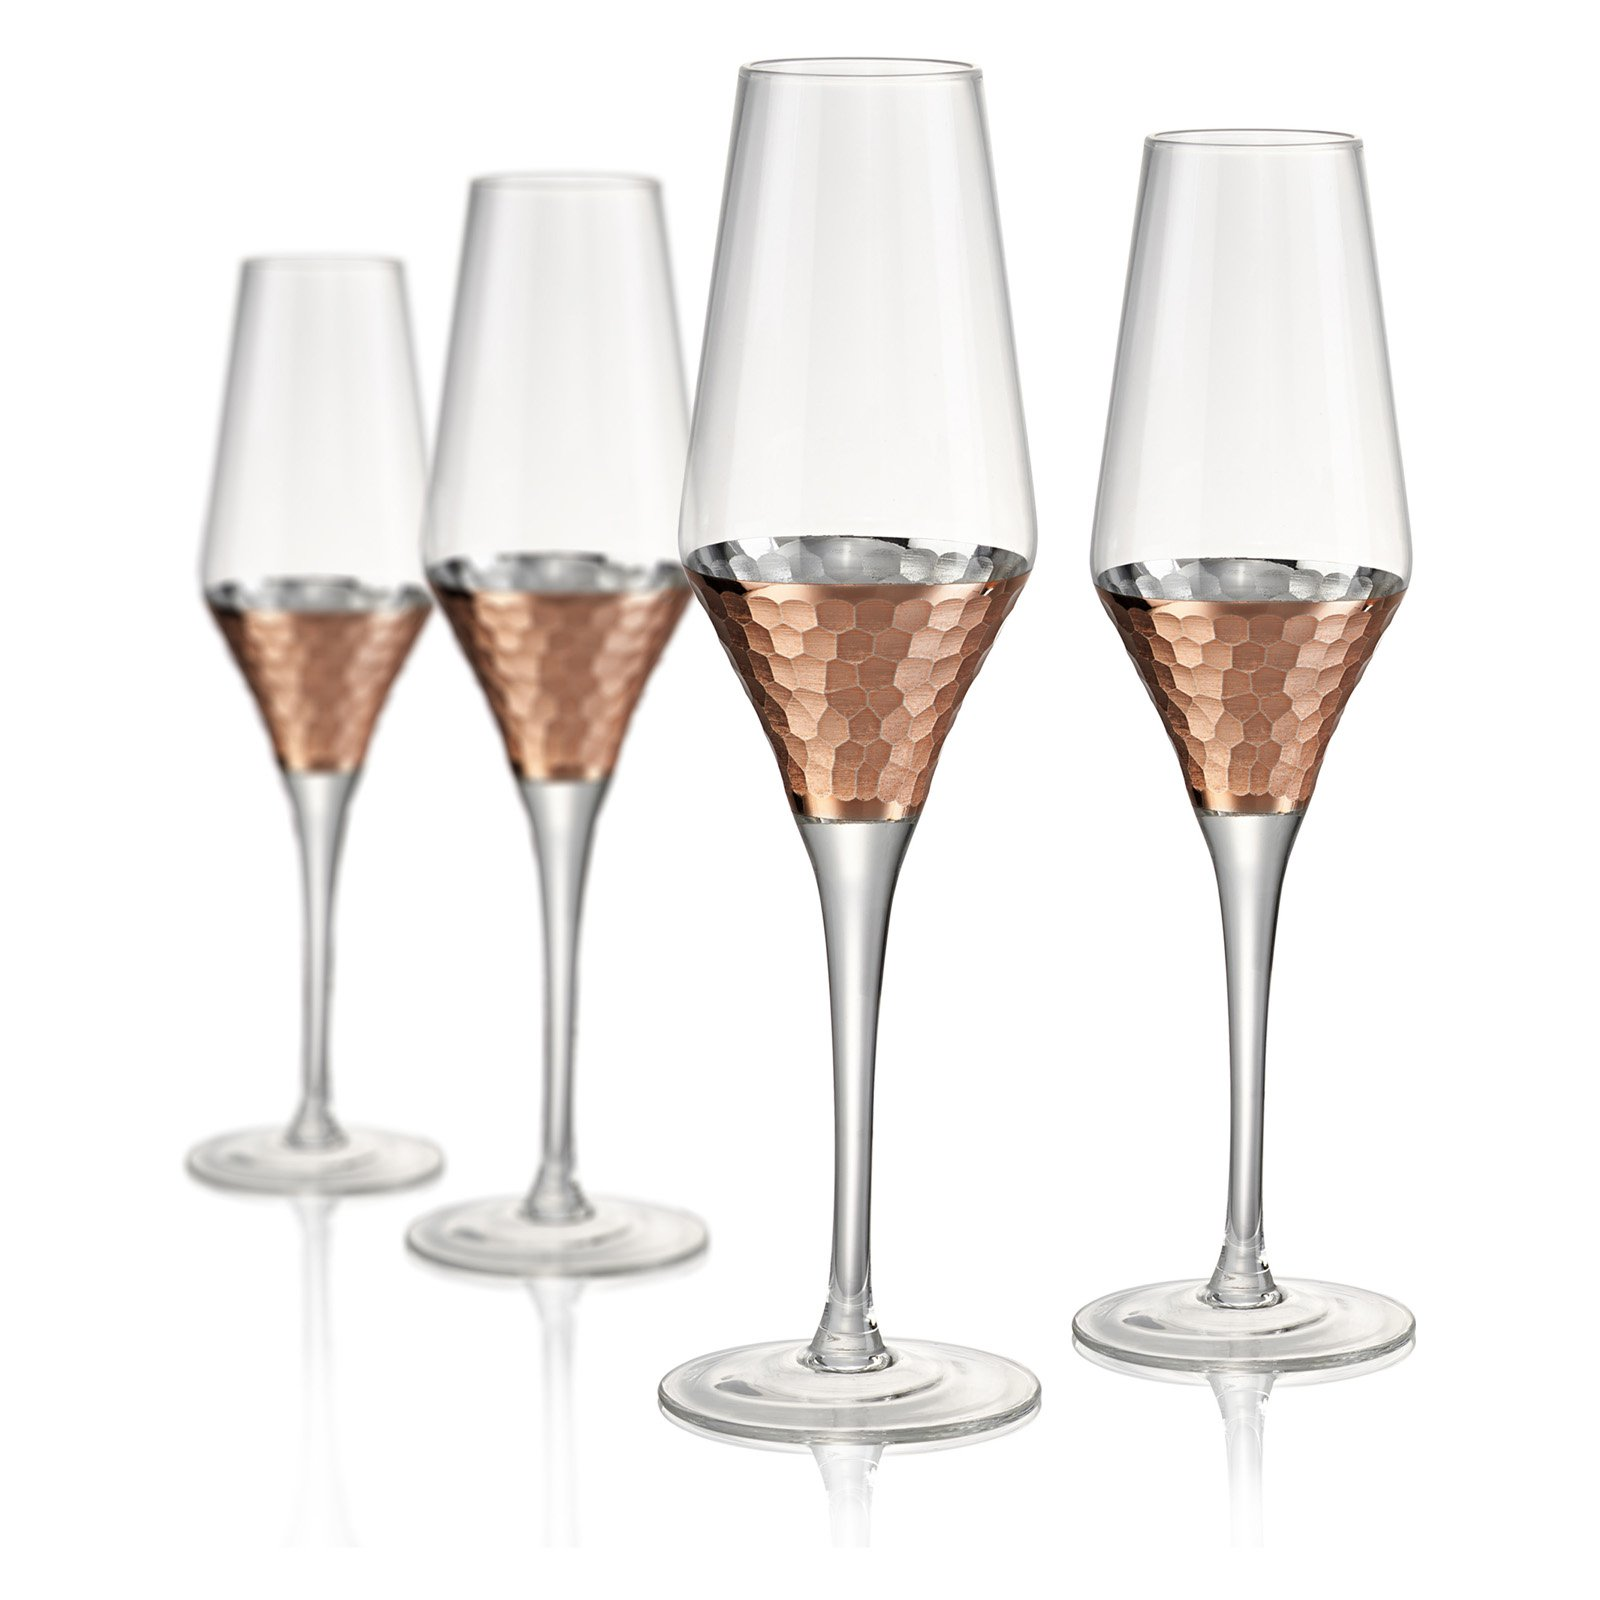 Artland Coppertino Hammer Champagne Flute - Set of 4